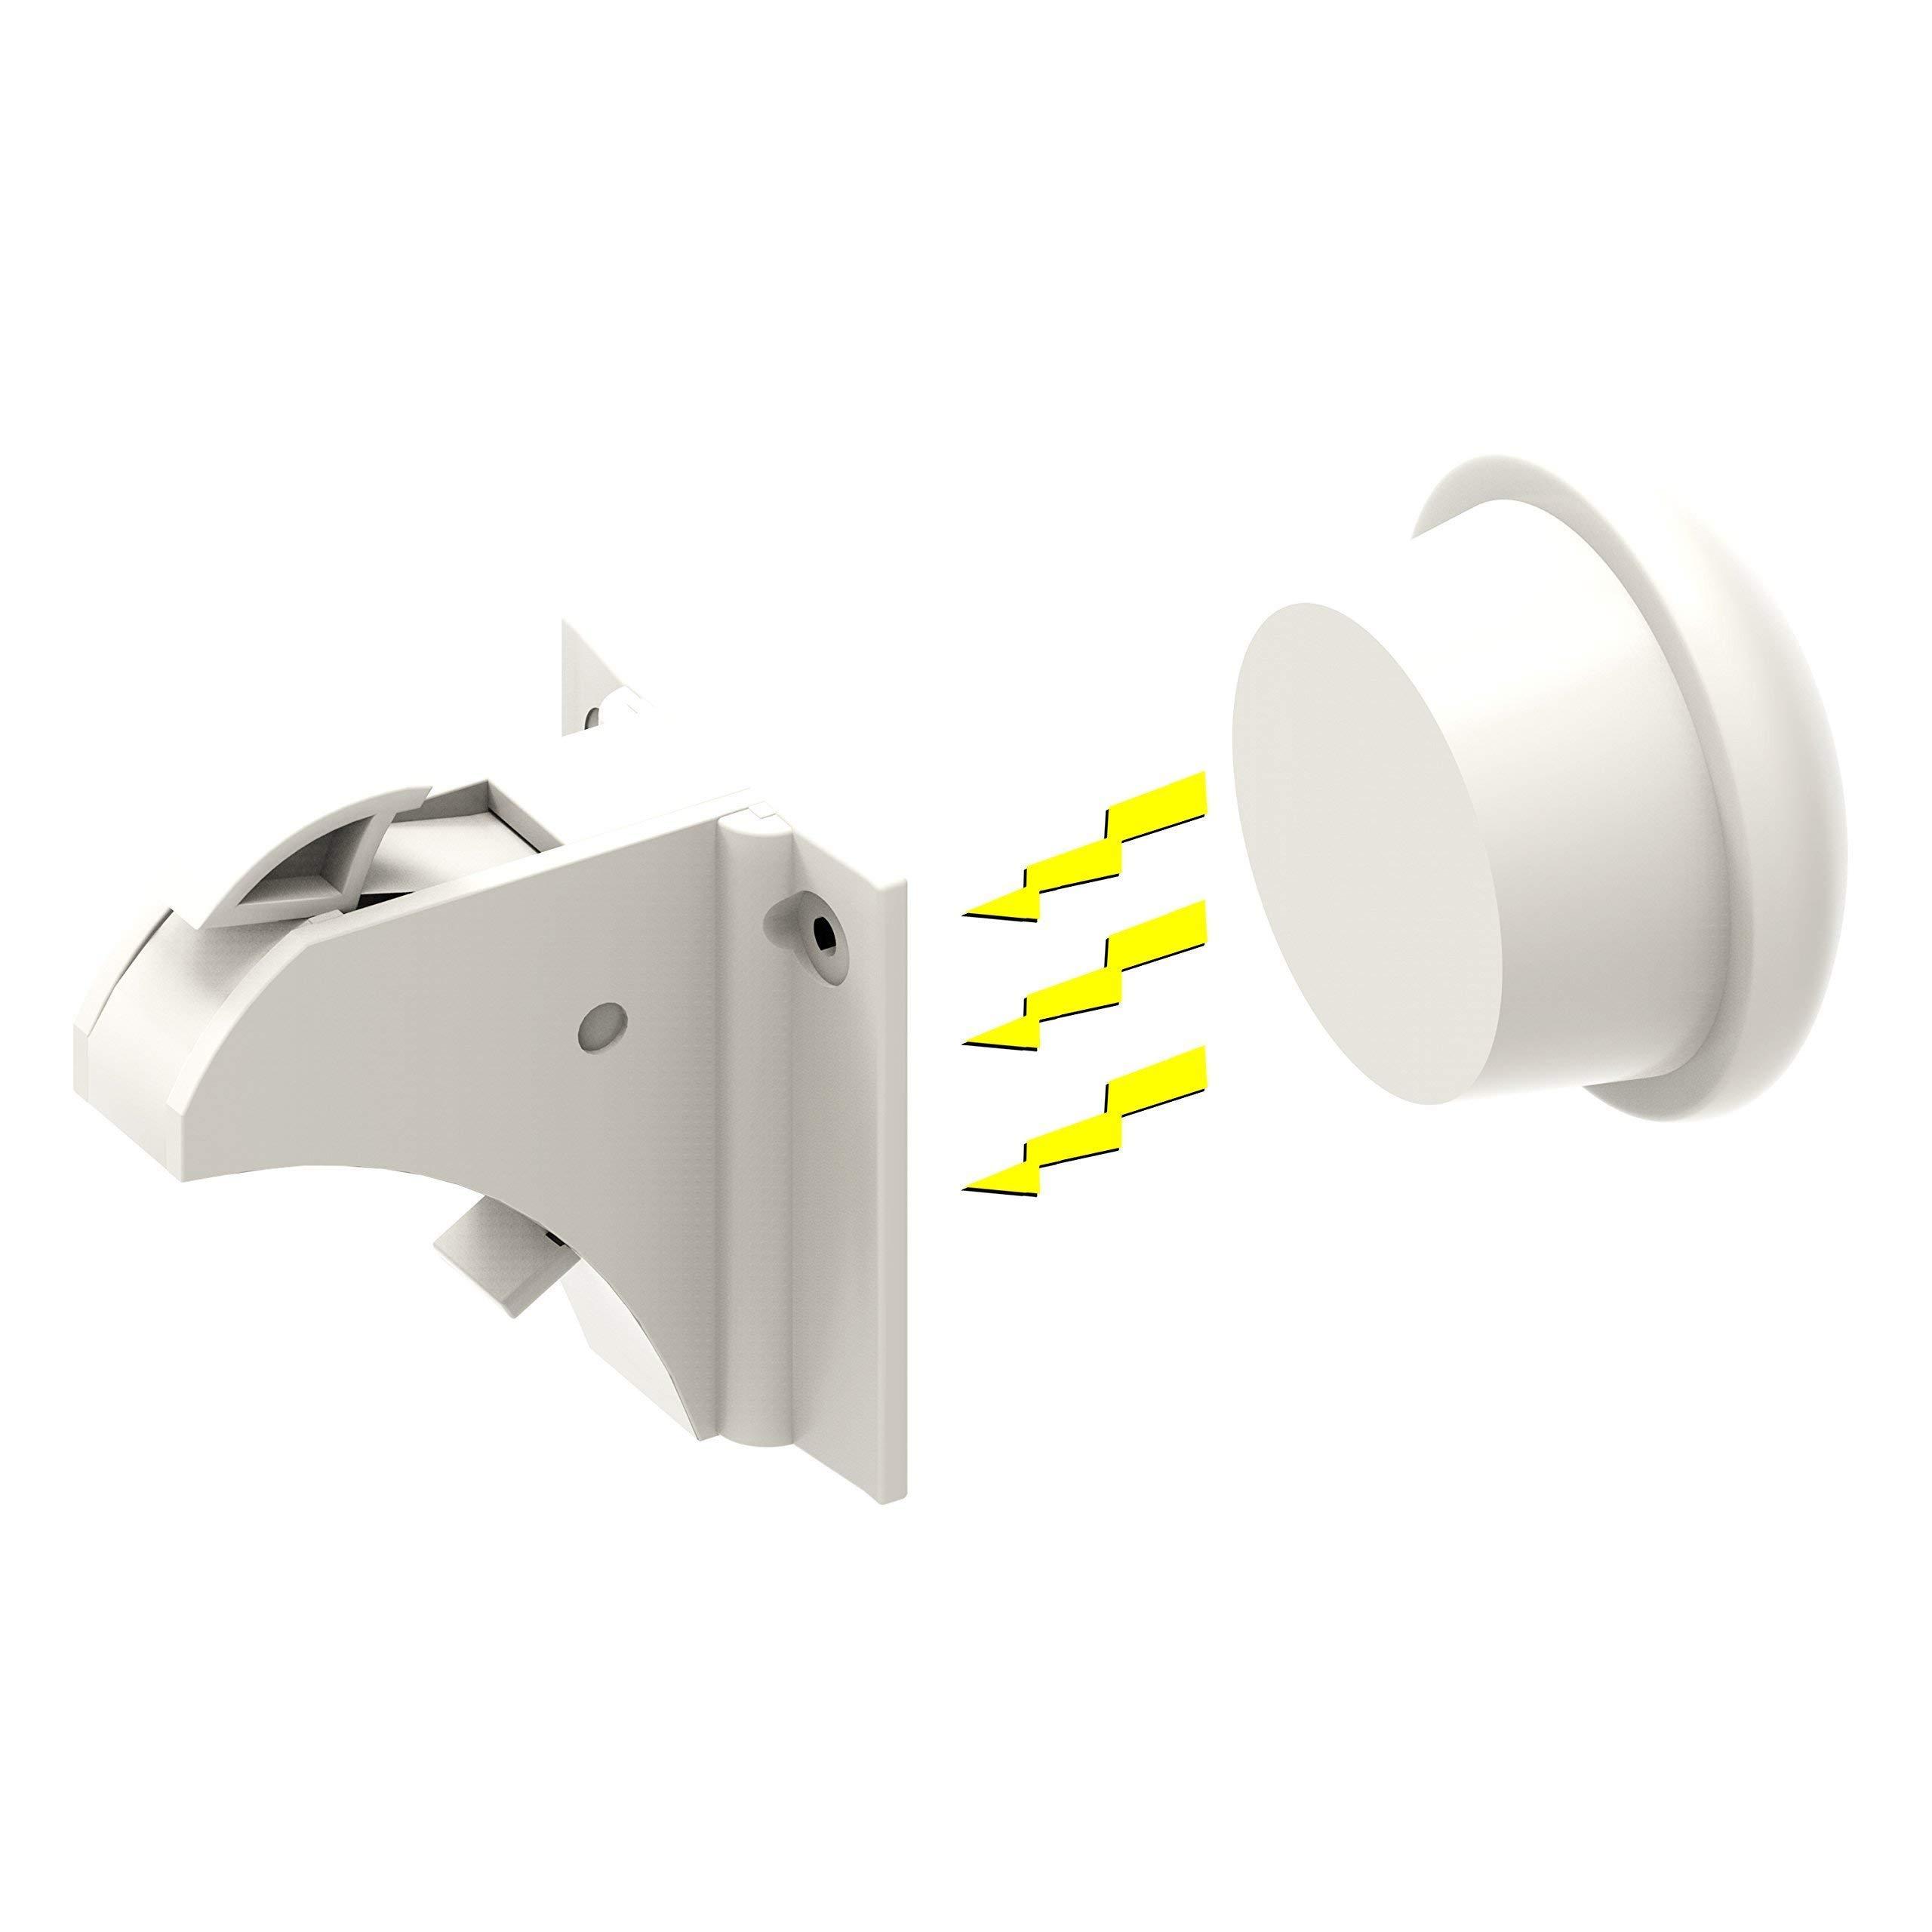 Magnetic Cabinet Locks -Baby Safety Child Proof Cabinet & Drawers -12 Locks + 3 Keys + Installation Cradle